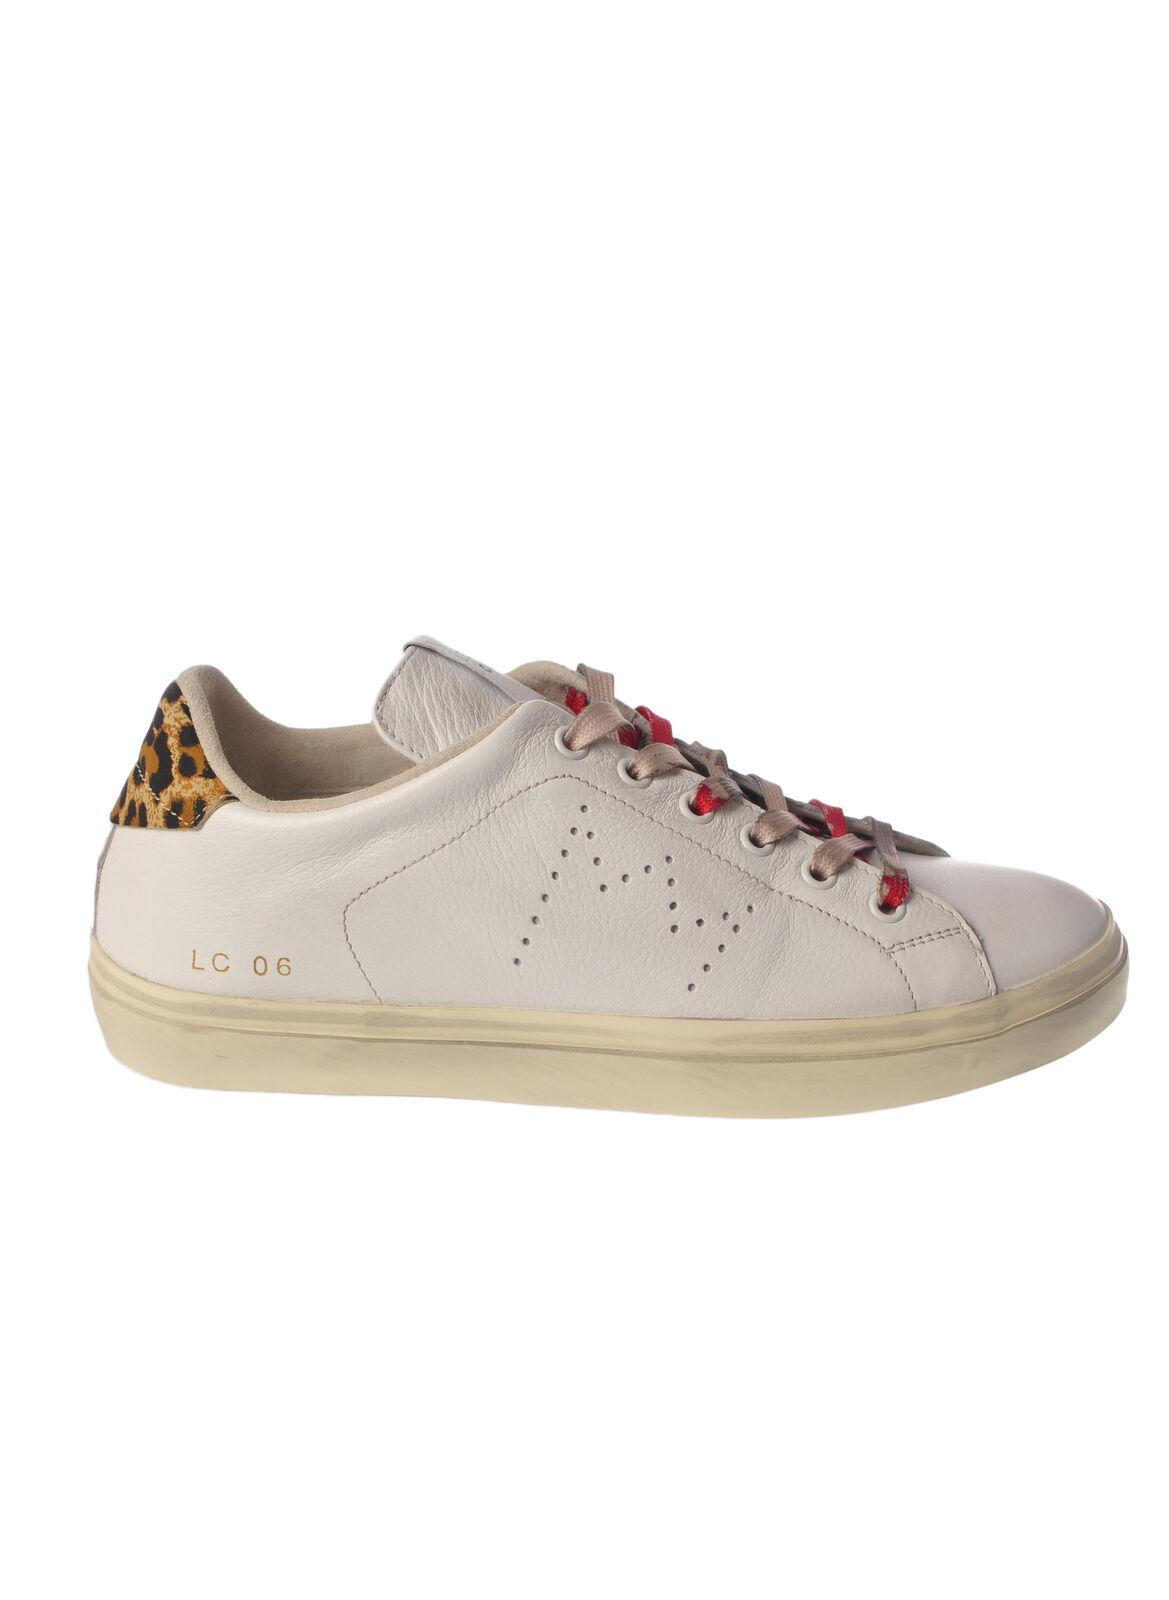 Leather Crown - Schuhe-Turnschuhe-niedrige - Frau - Weiß - 4994011D183900